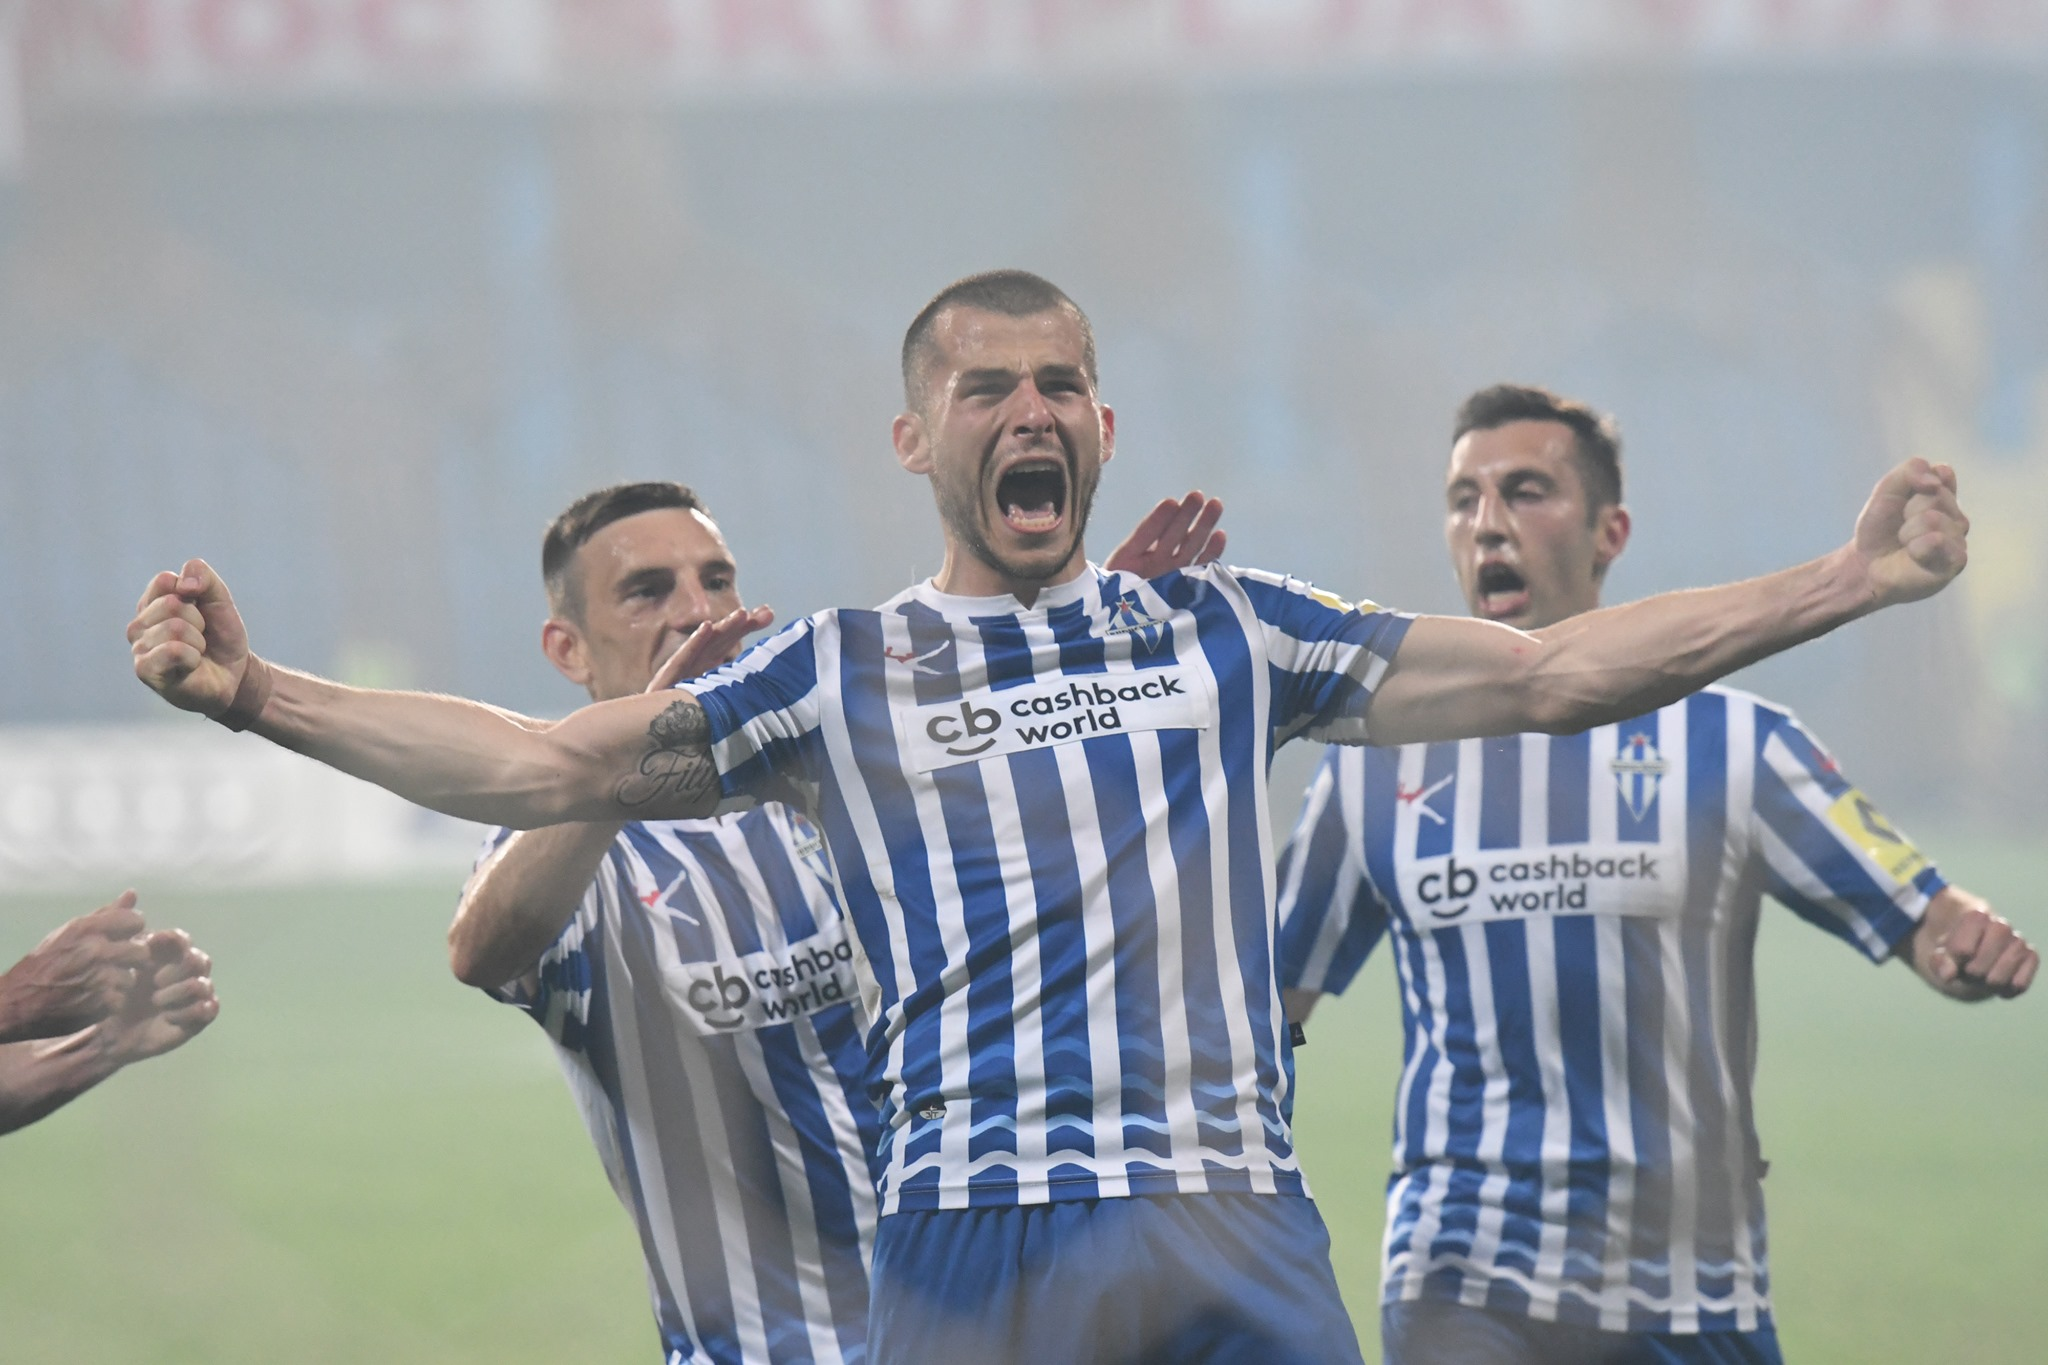 Prva Liga Montenegro 14 agosto: i pronostici